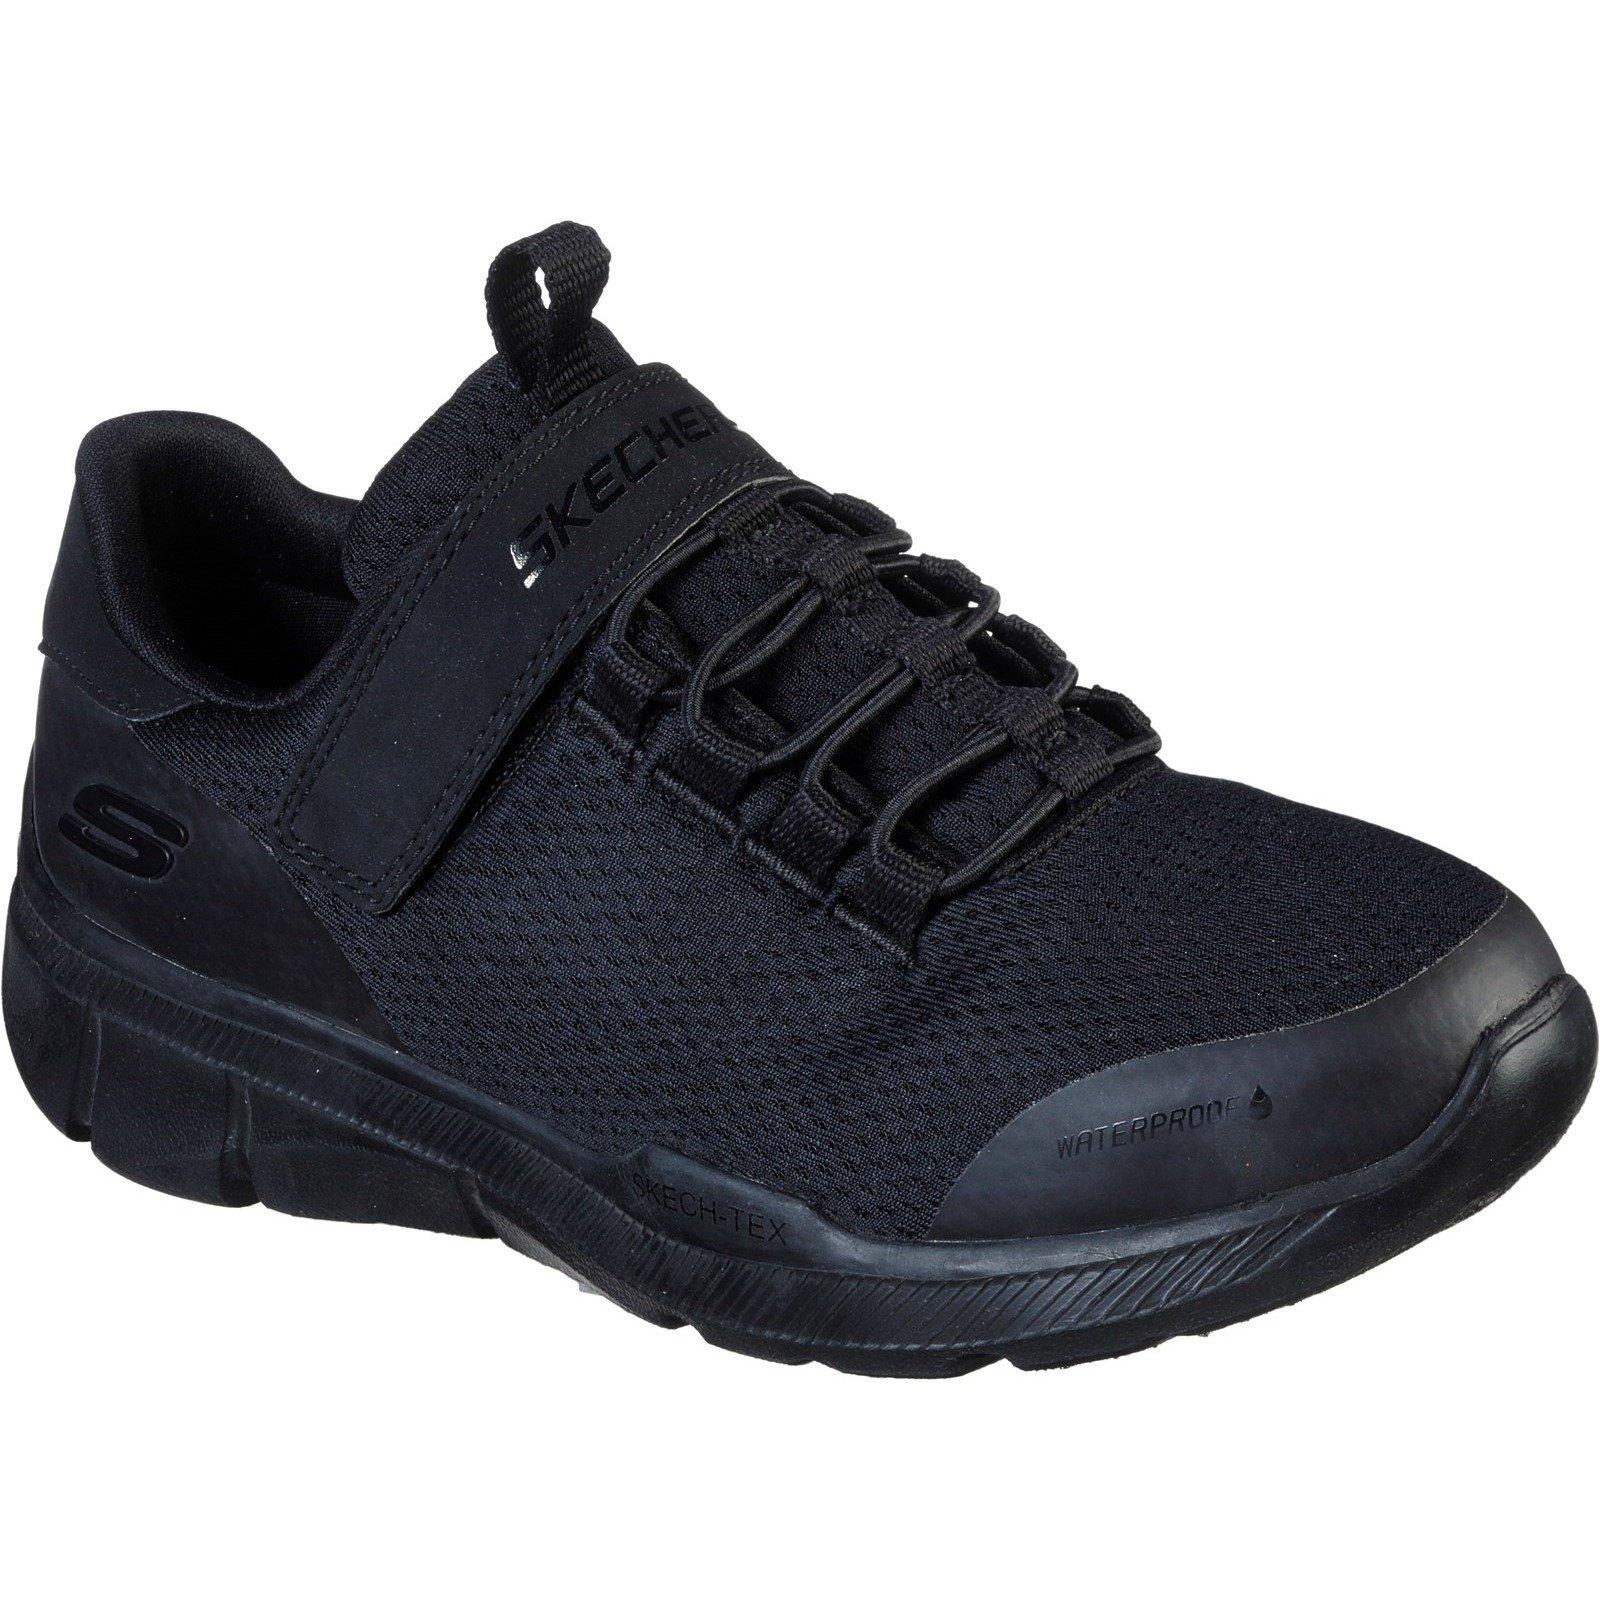 Skechers Unisex Equalizer 3.0 Aquablast Trainer Black 28533 - Black 3